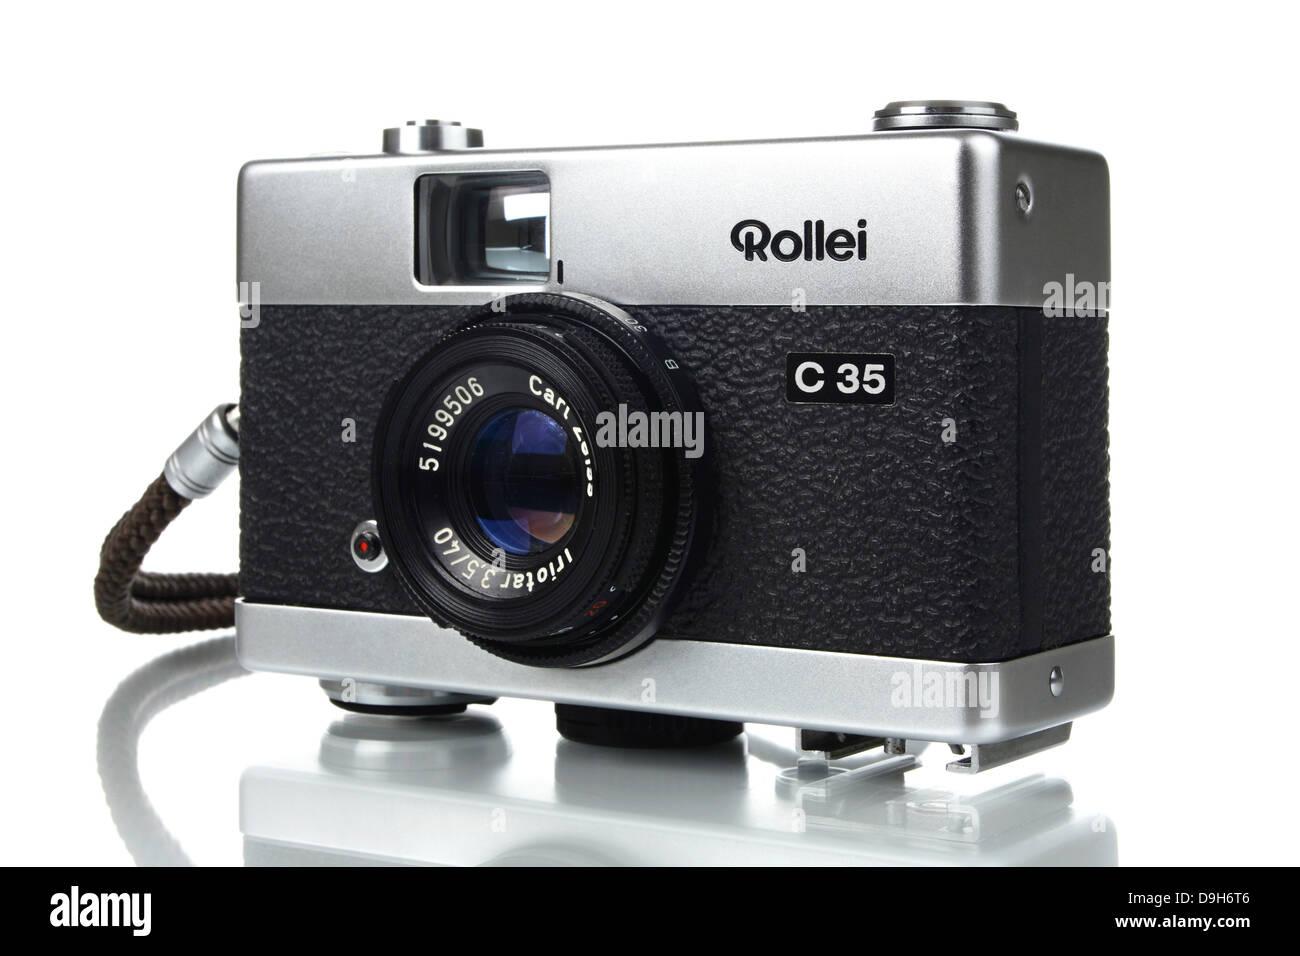 Miniature camera Rollei C35 Stock Photo